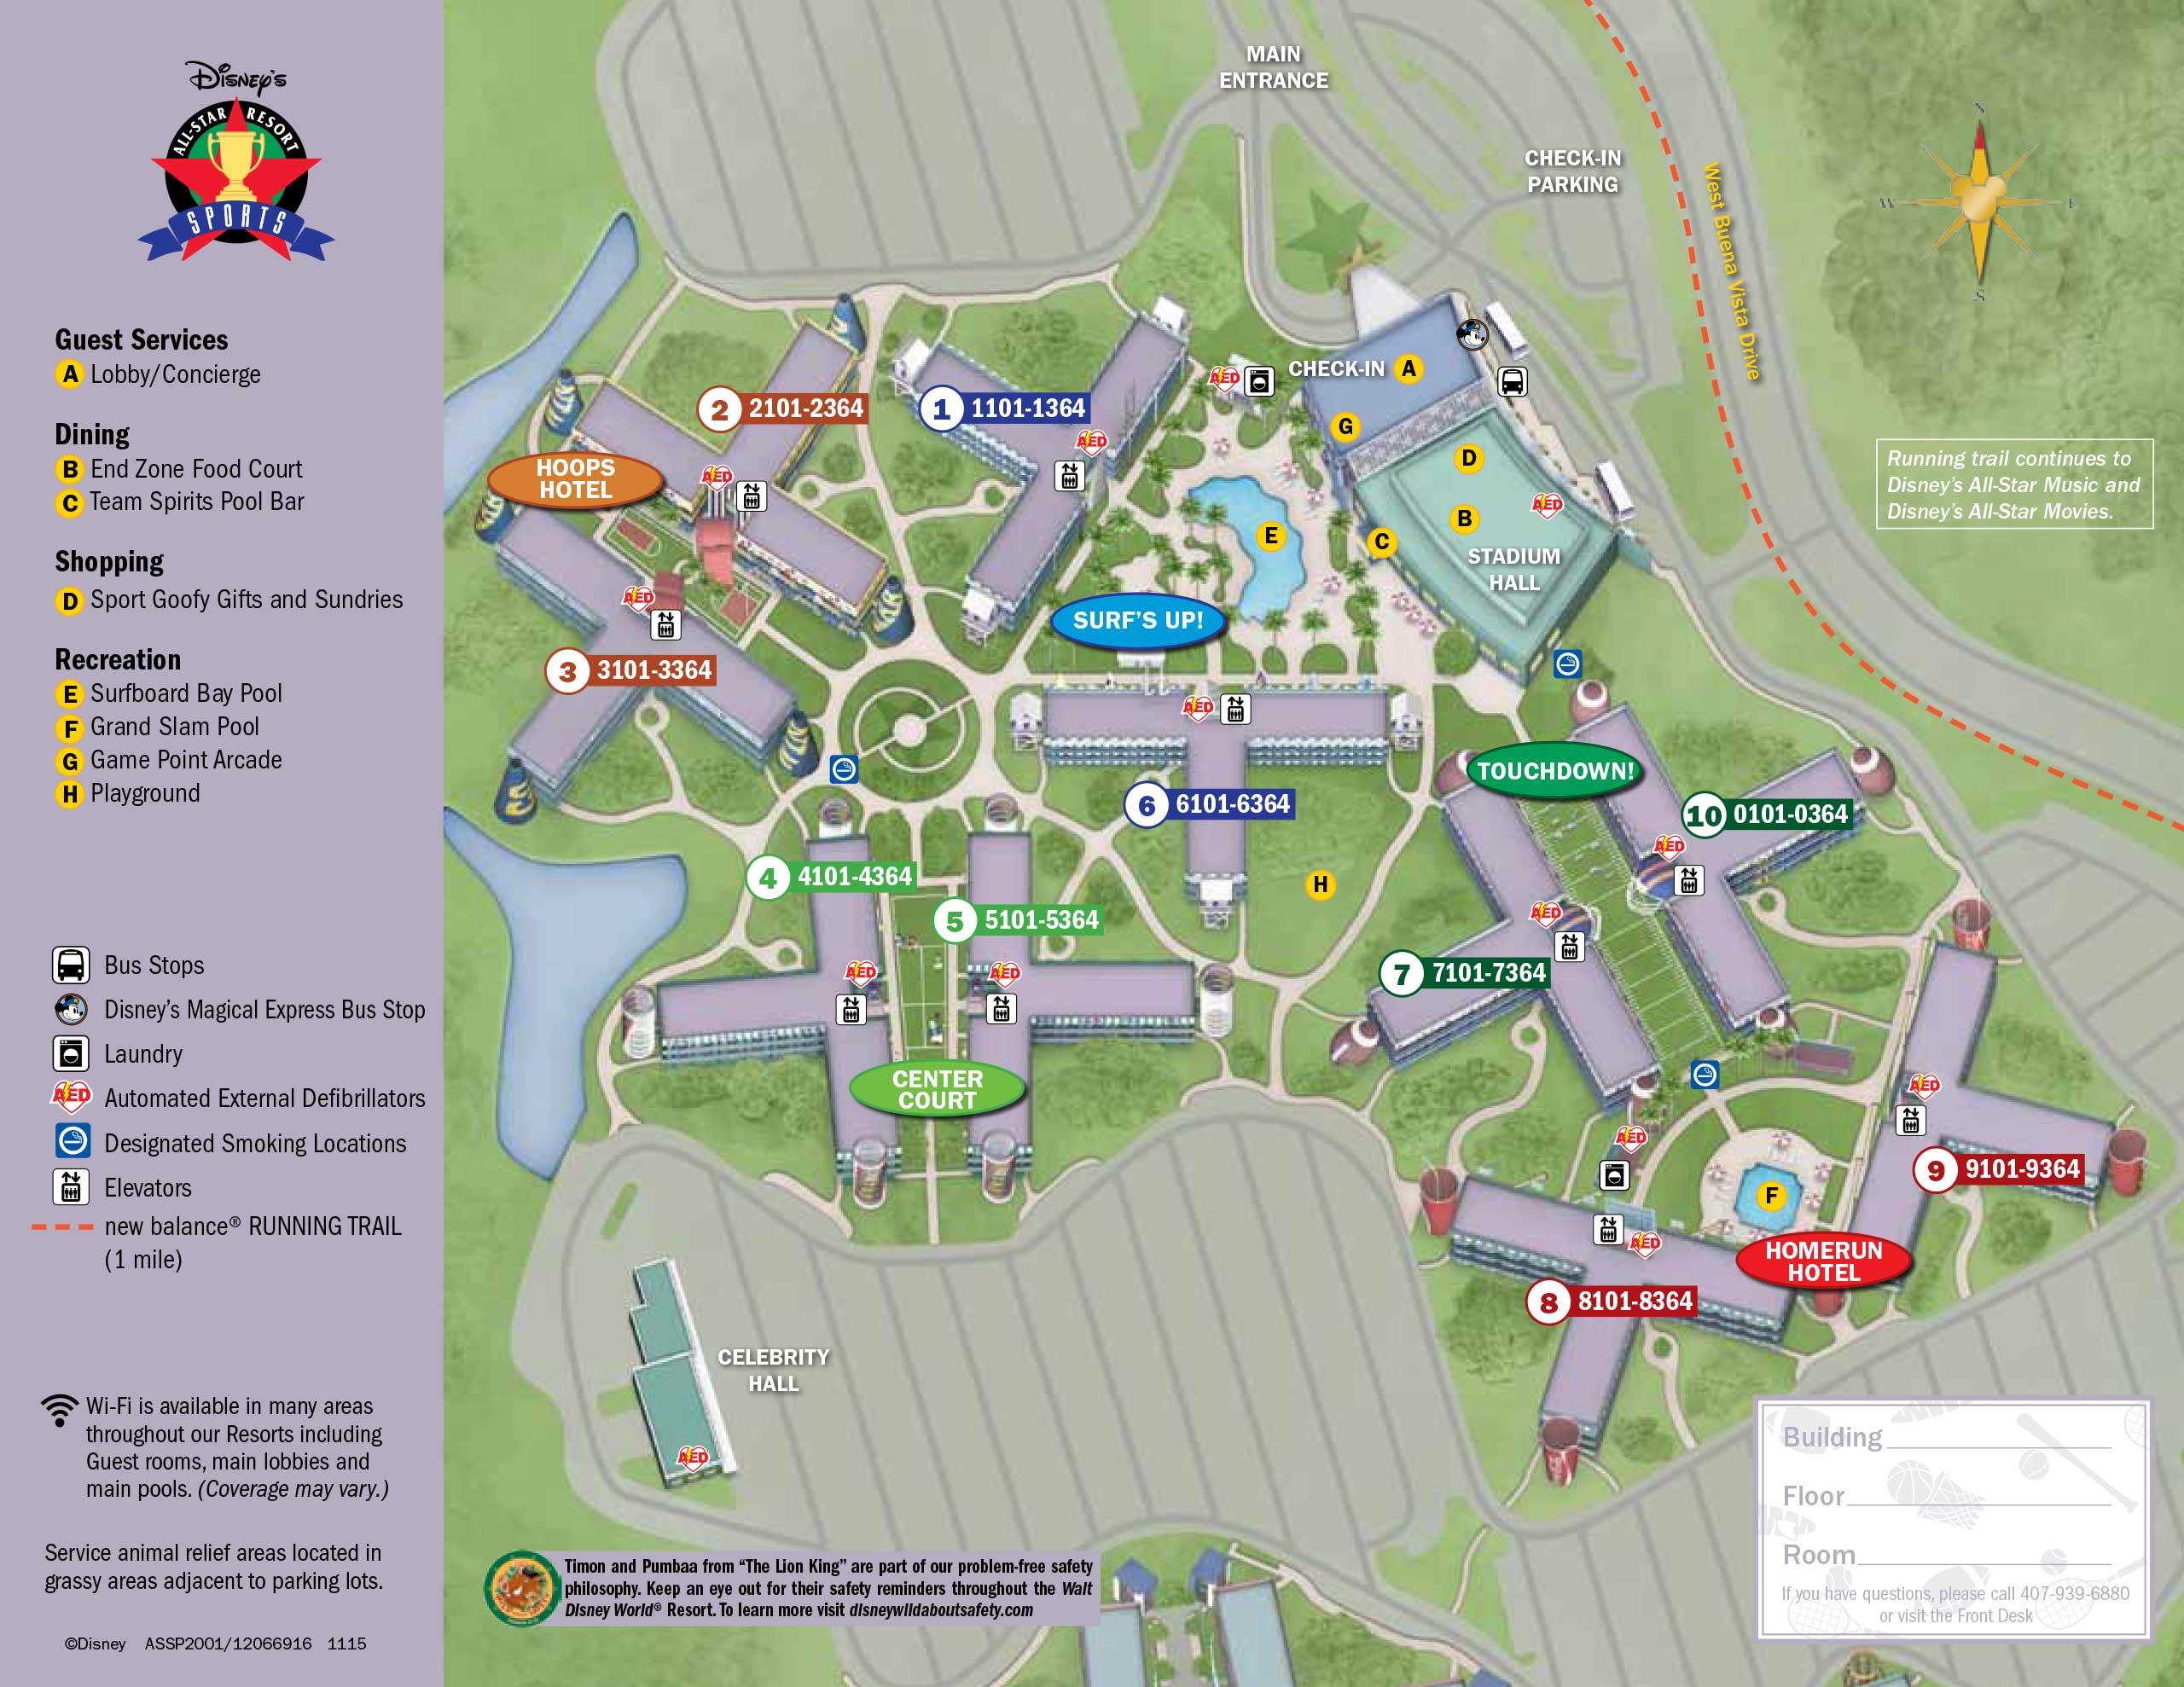 April 2017 Walt Disney World Resort Hotel Maps - Photo 4 of 33